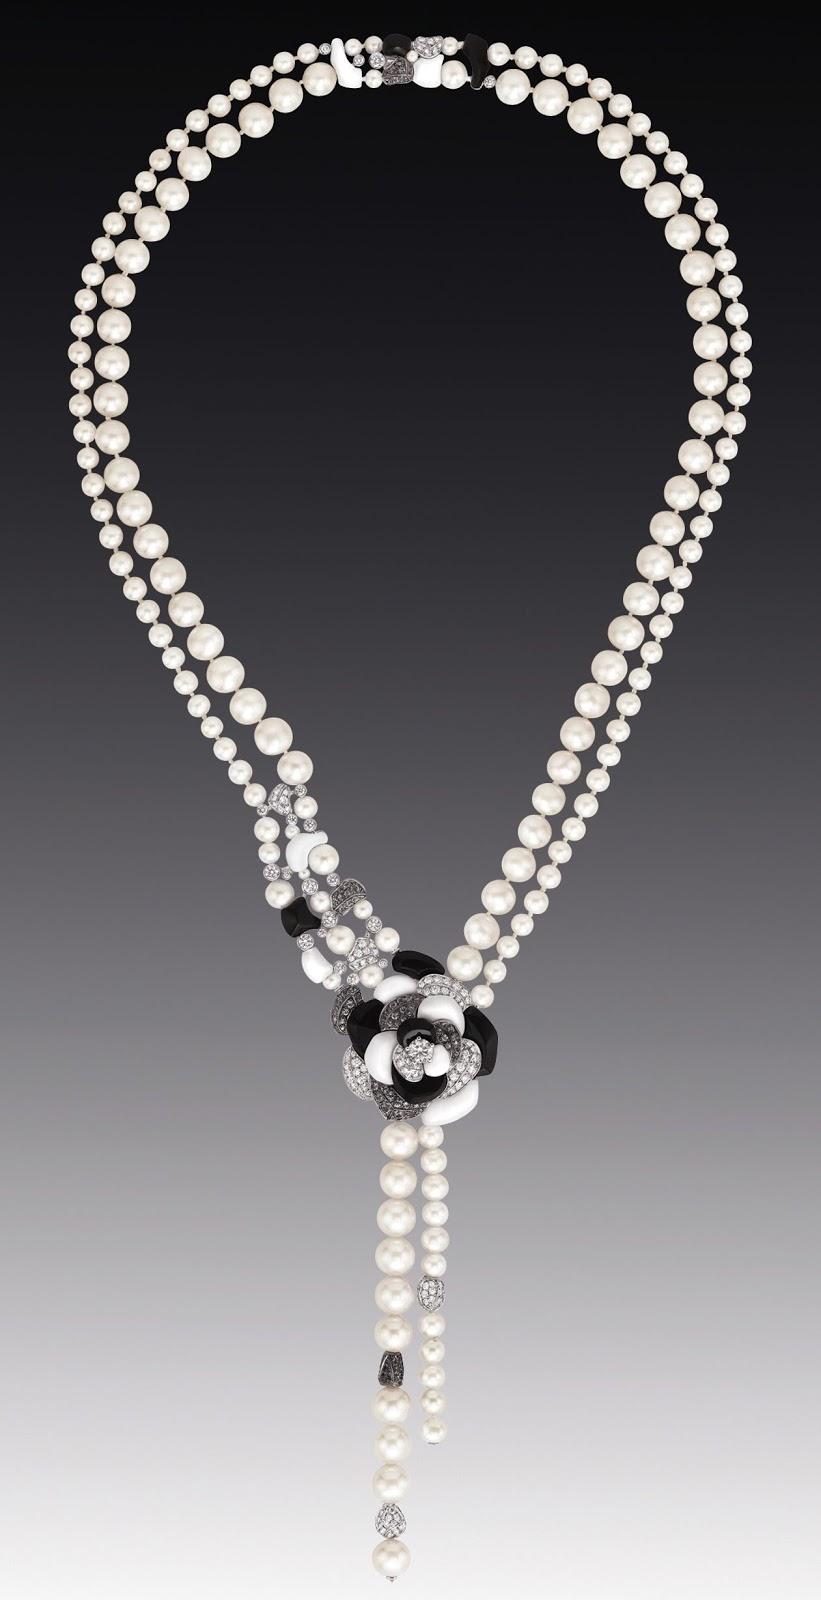 Chanel jardin de cam lias amazing new high jewellery for Jardin necklace